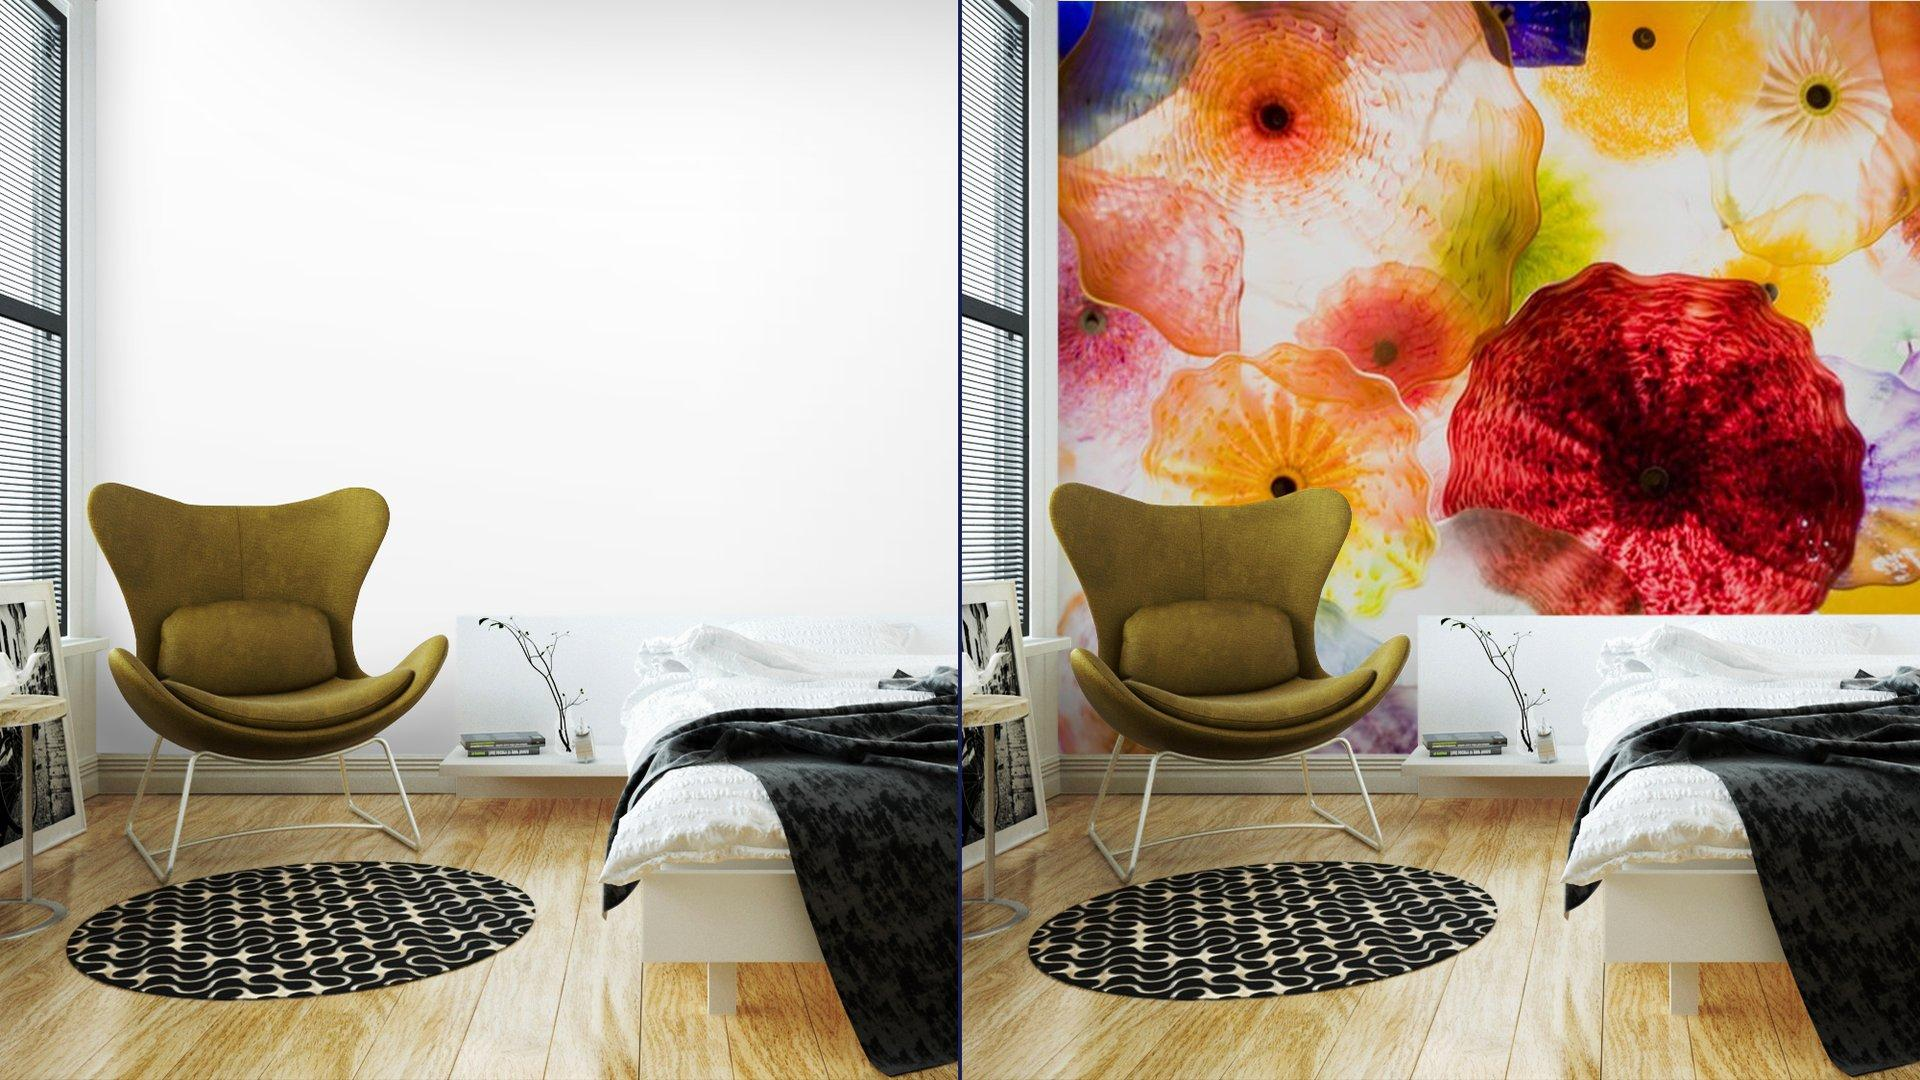 ARTE EN VIDRIO8 - Fotomural Tapiz Patrón Floral 01